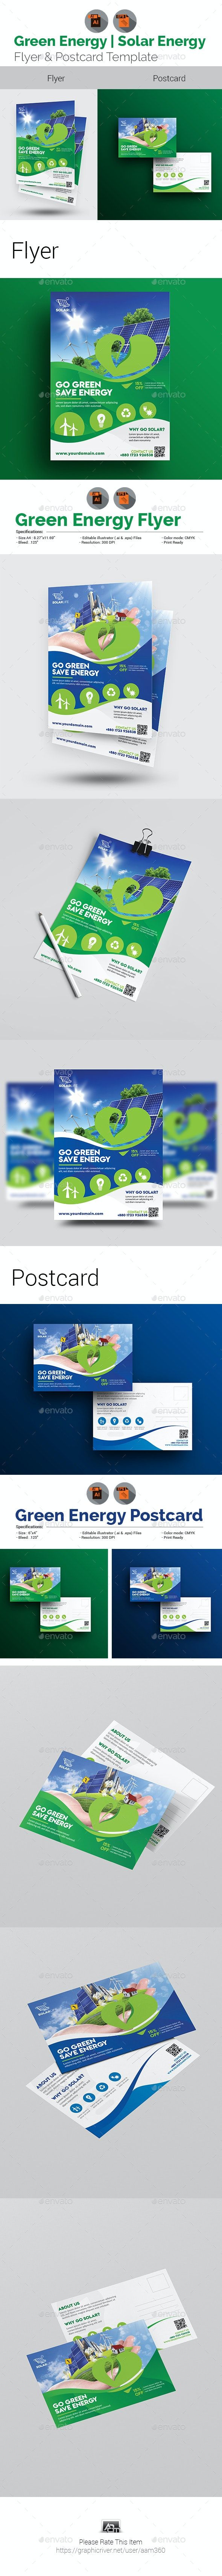 Green Energy Flyer & Postcard Bundle - Corporate Flyers